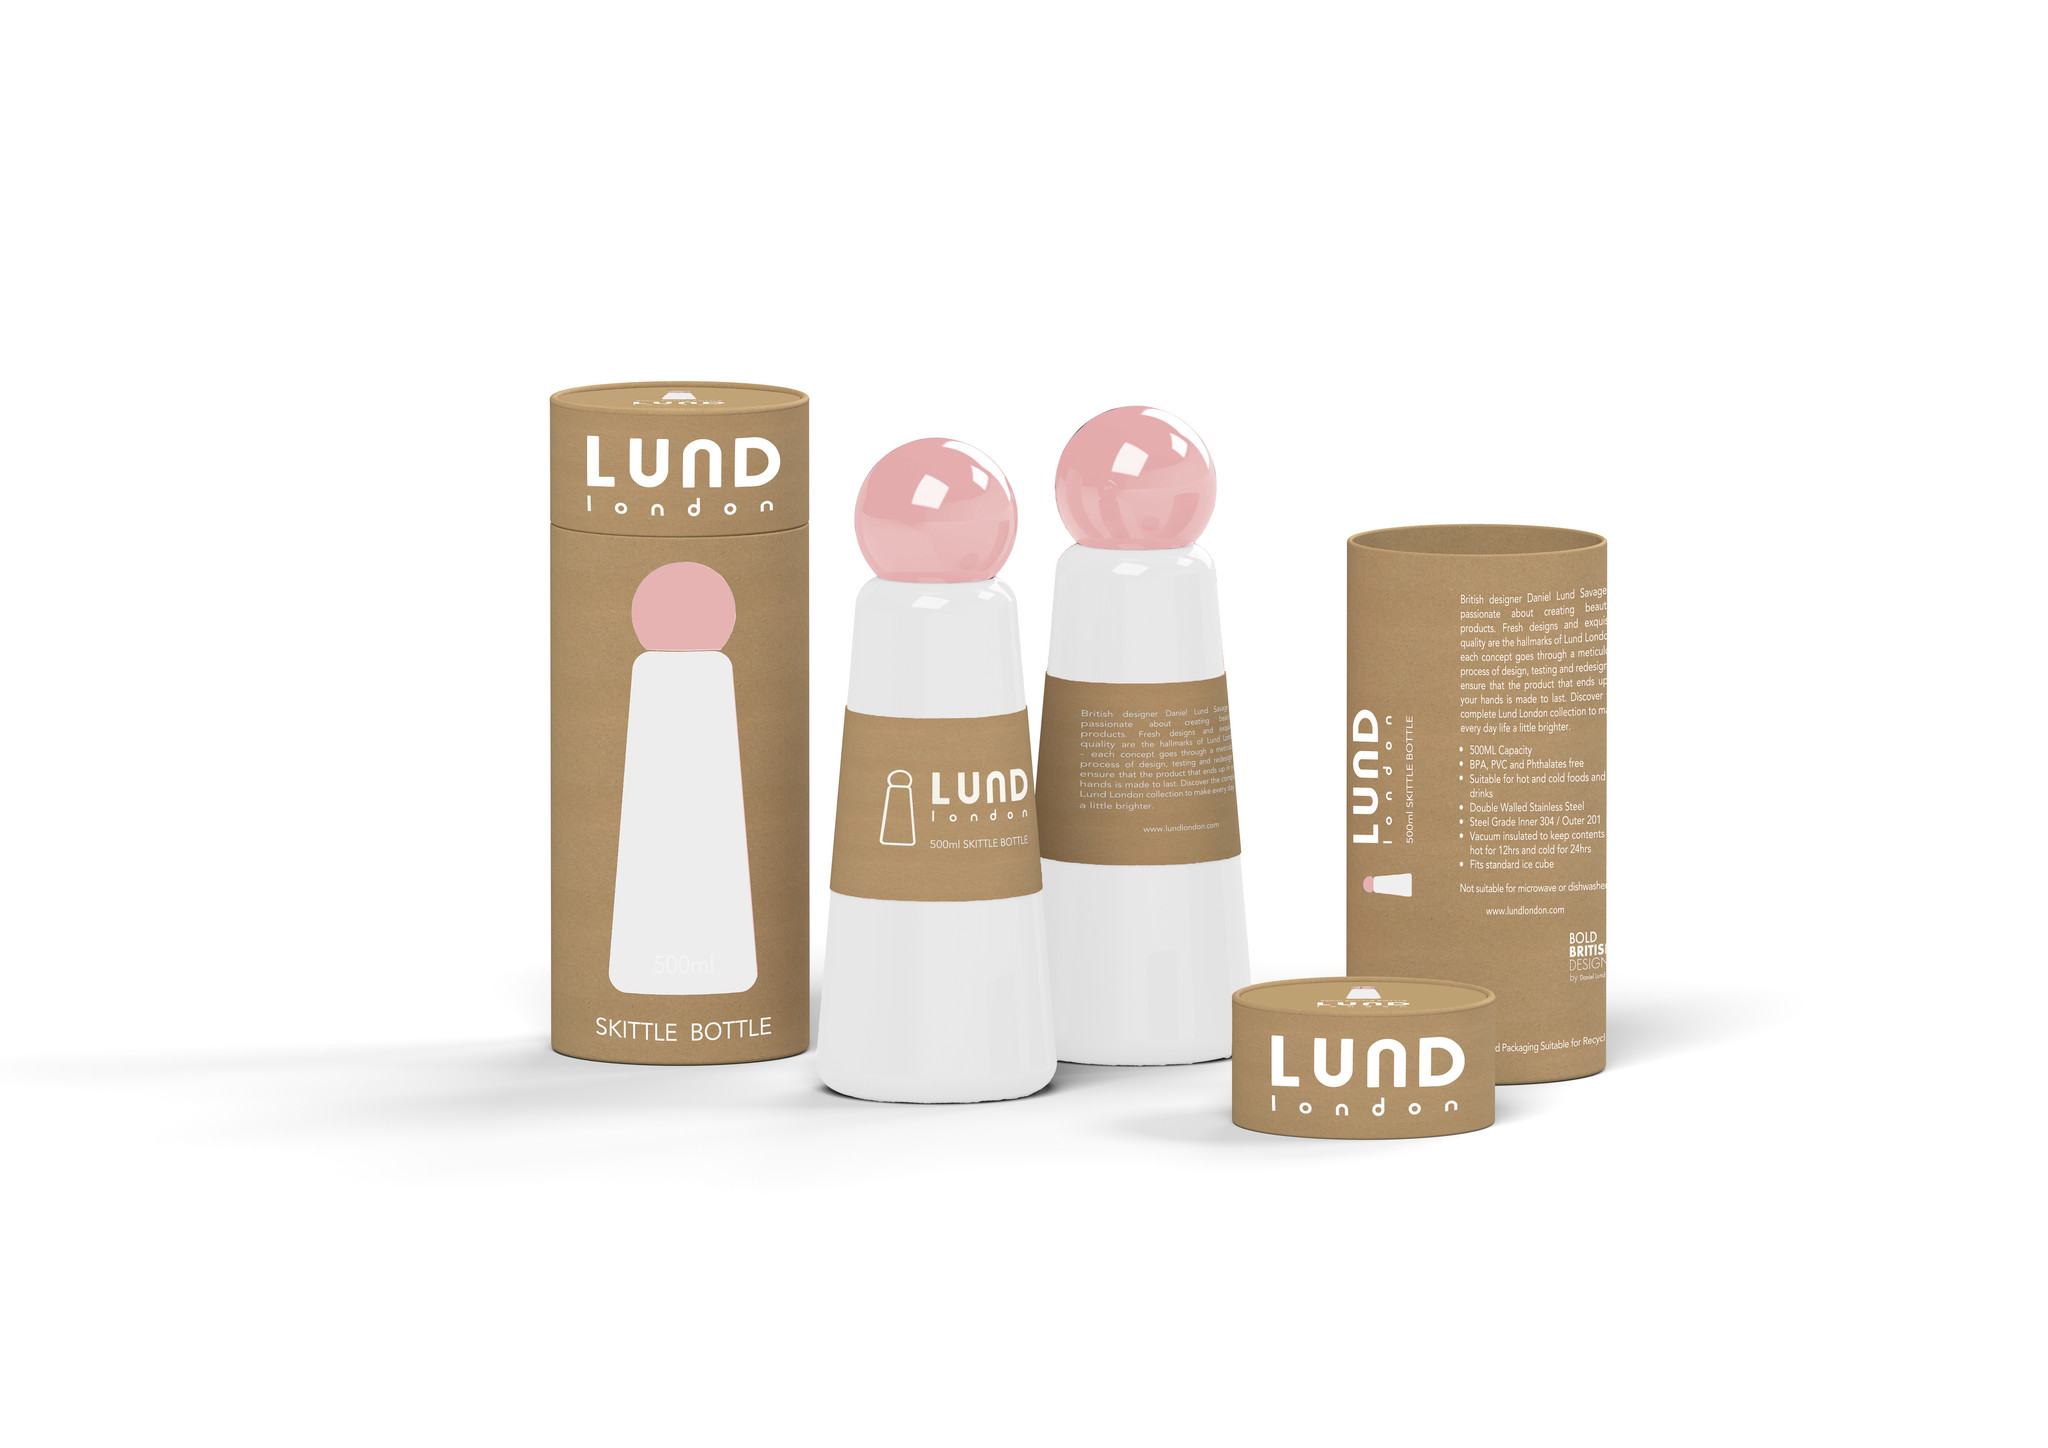 LUND Reusable Bottle White